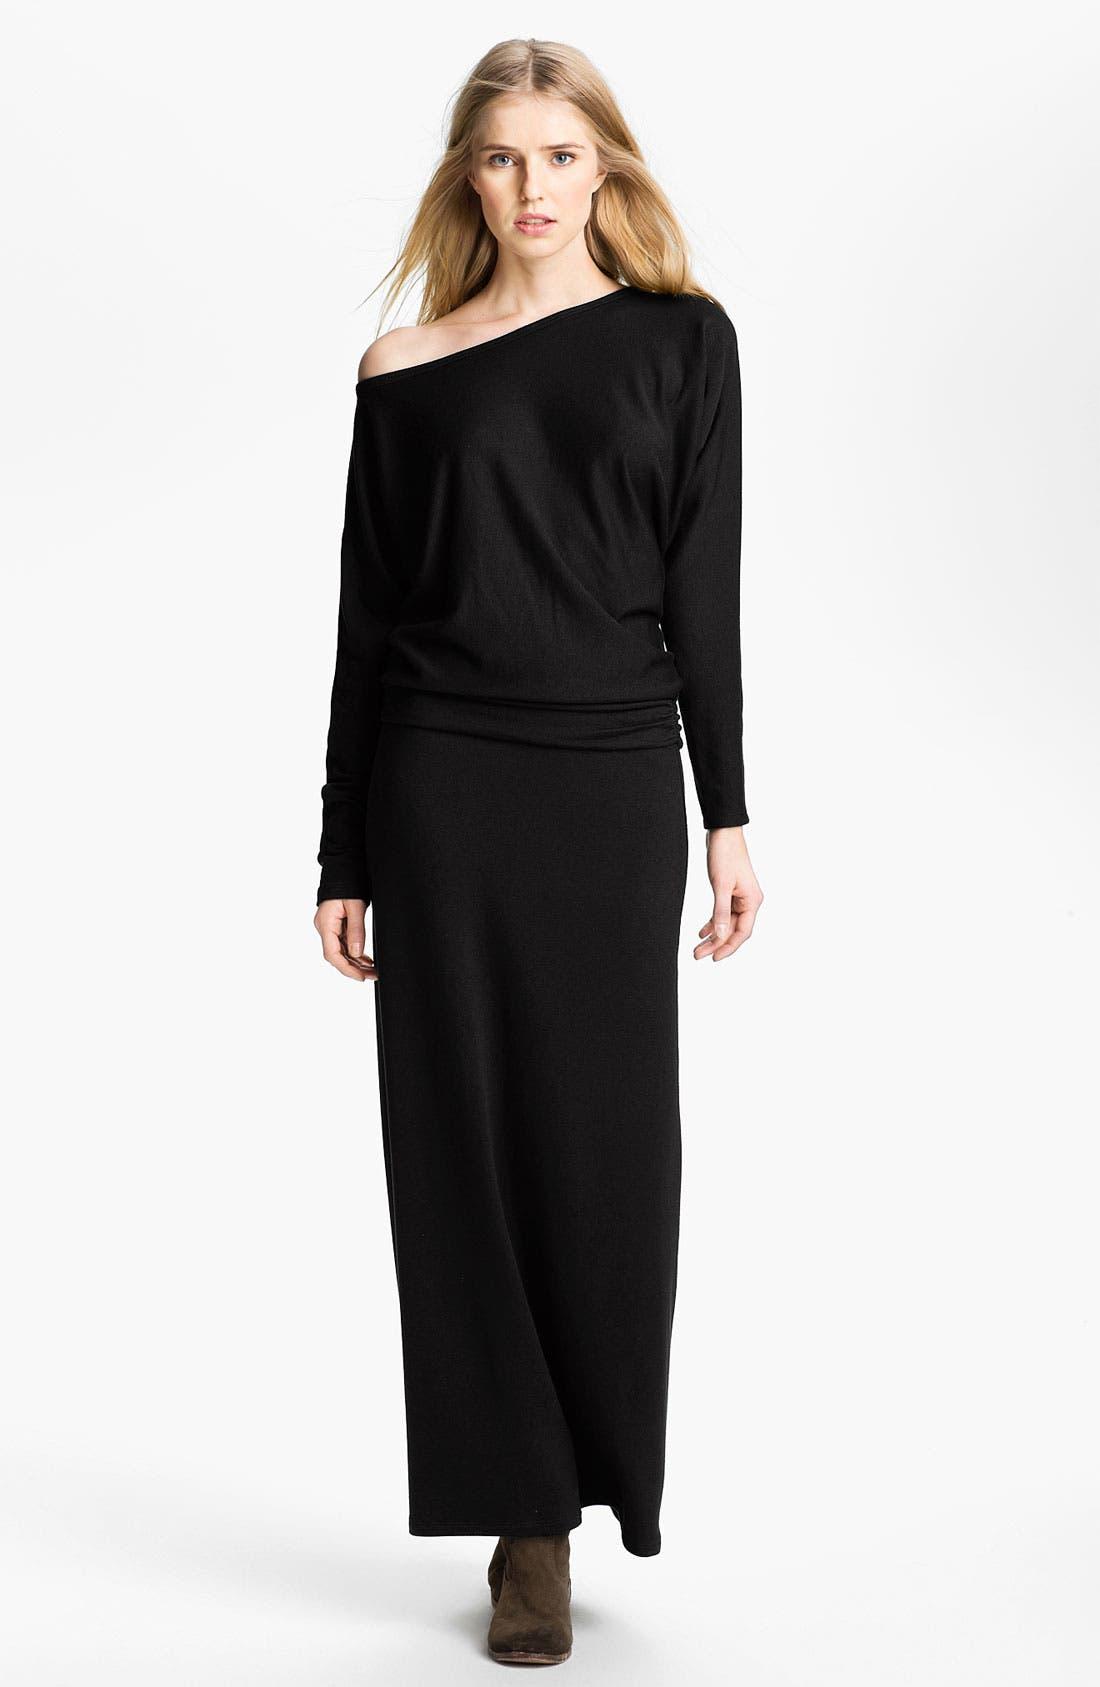 Main Image - Tart 'Yvonne' Off the Shoulder Sweater Maxi Dress